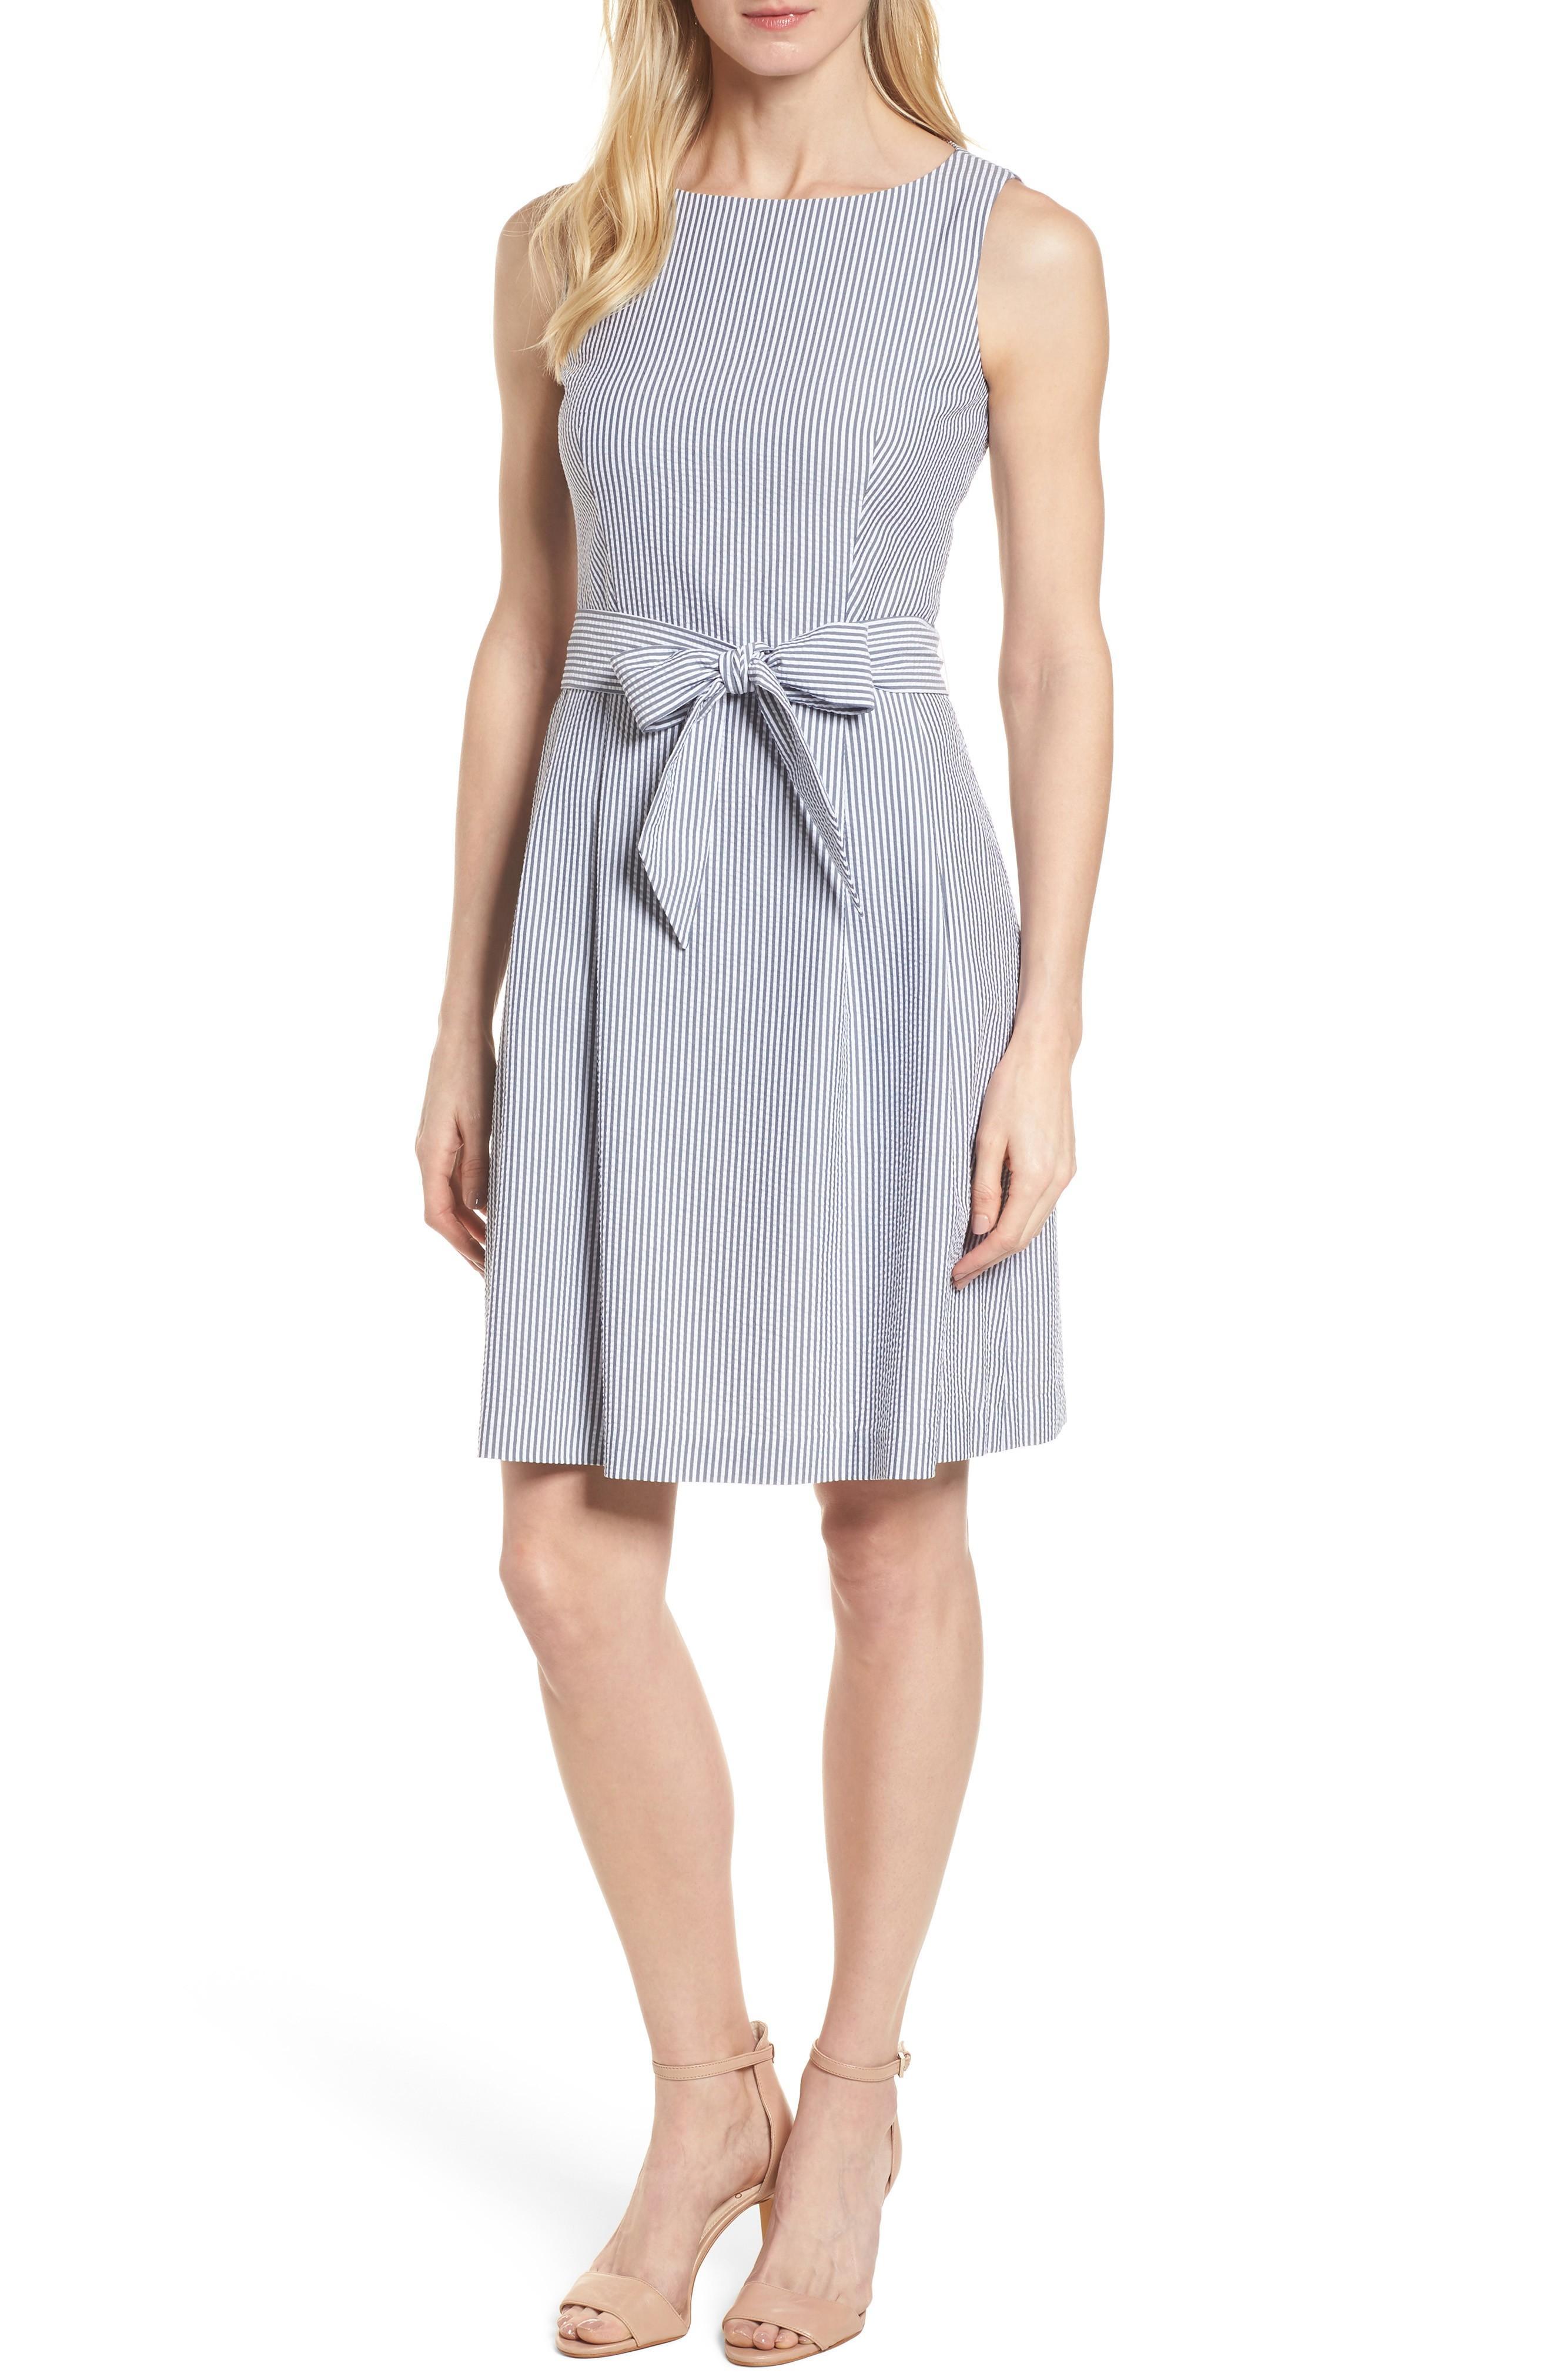 Anne Klein Seersucker Fit & Flare Dress In Optic White/ Breton Blue